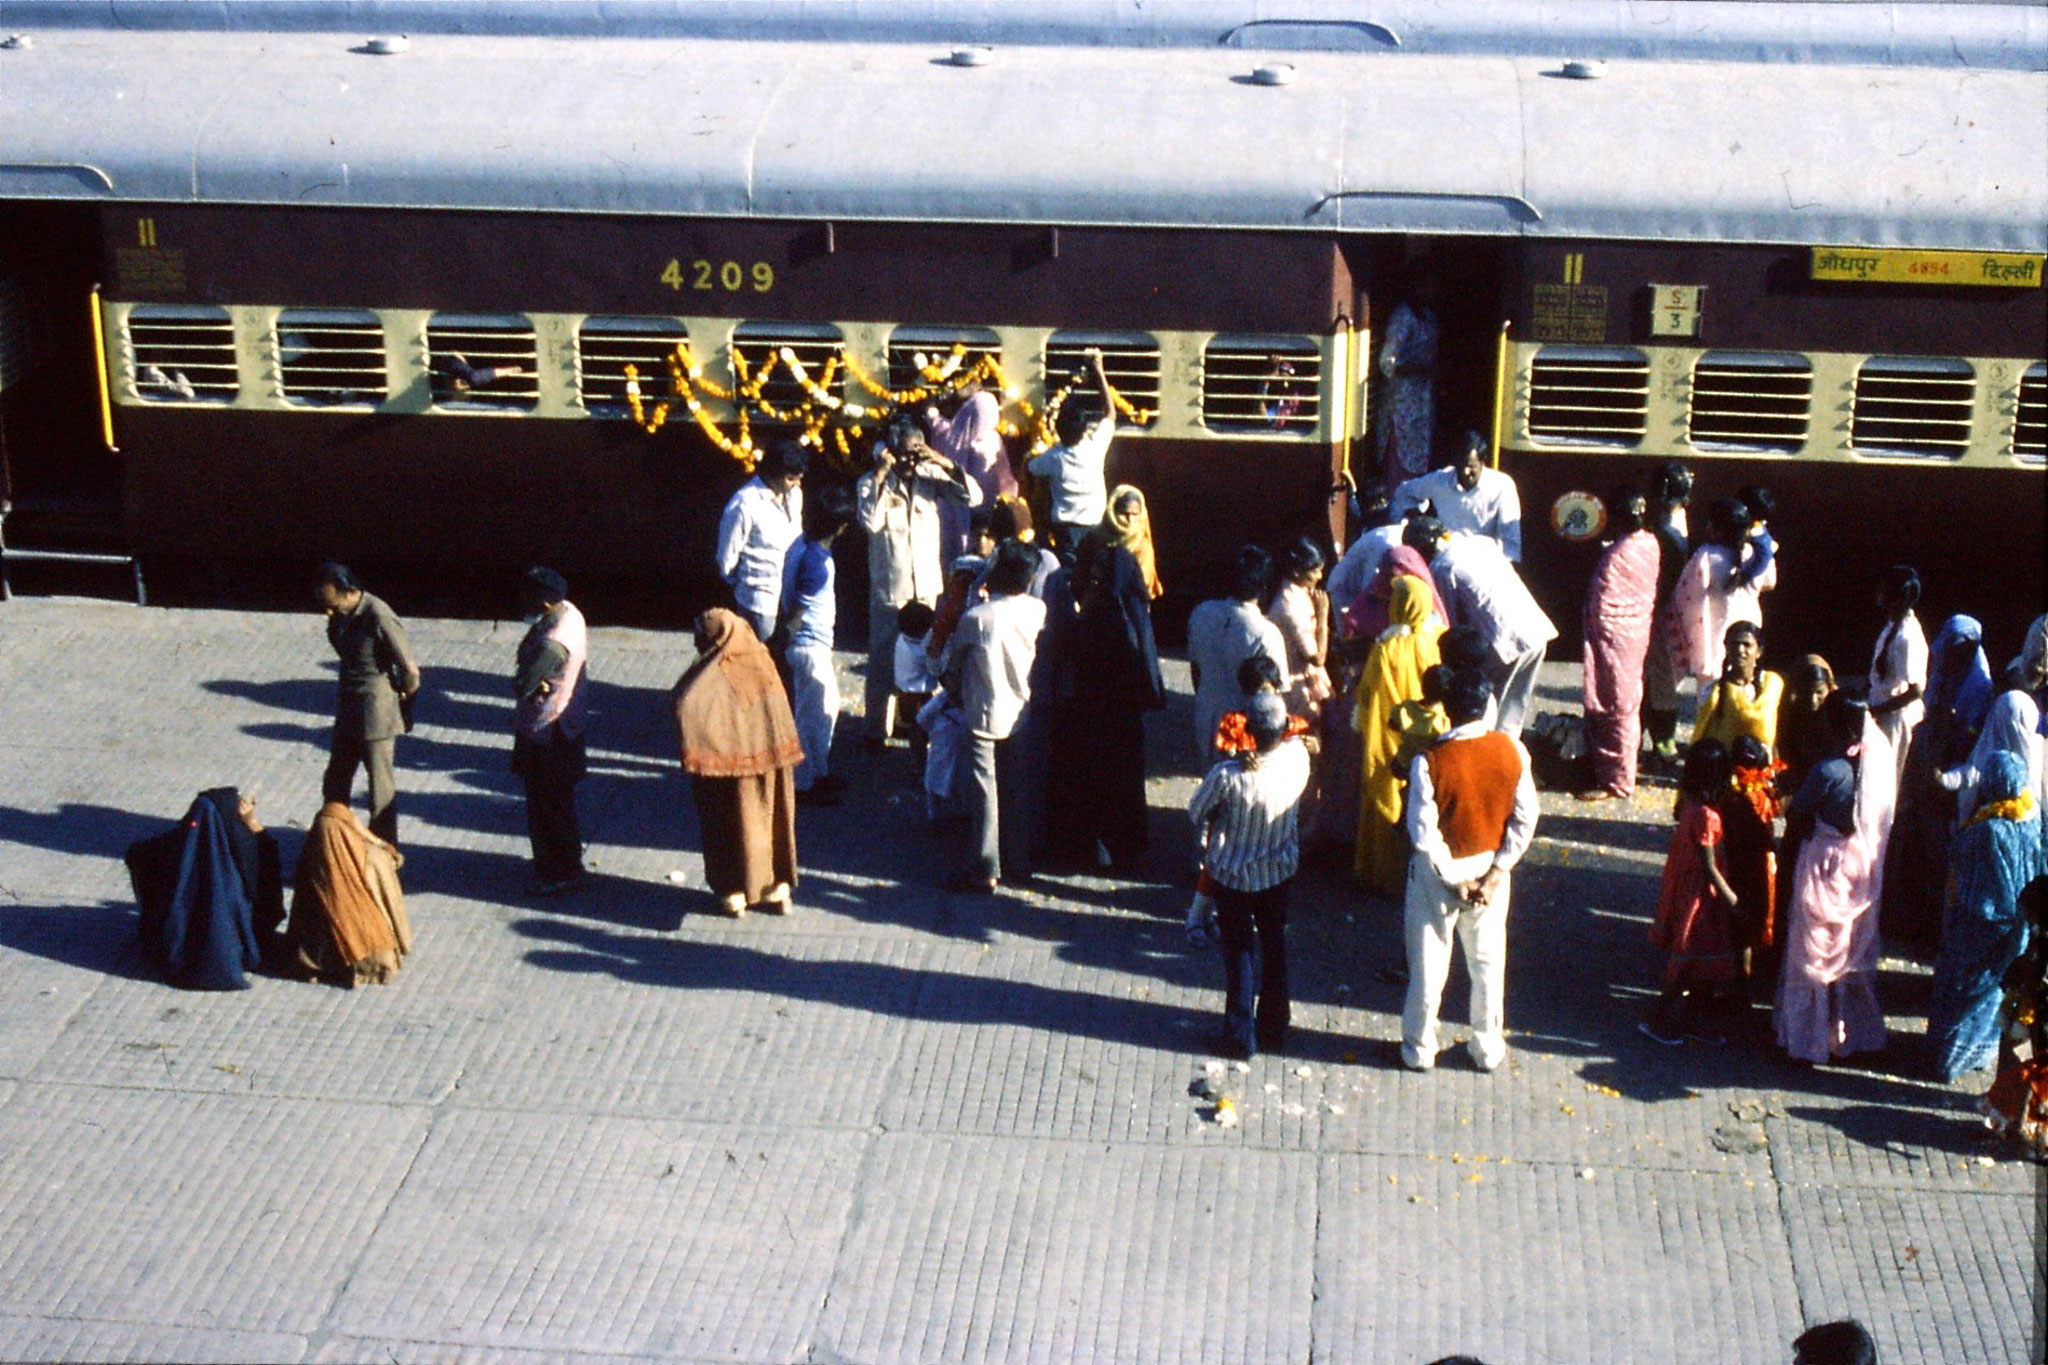 29/11/1989: 14: Jodhpur wedding party boarding train